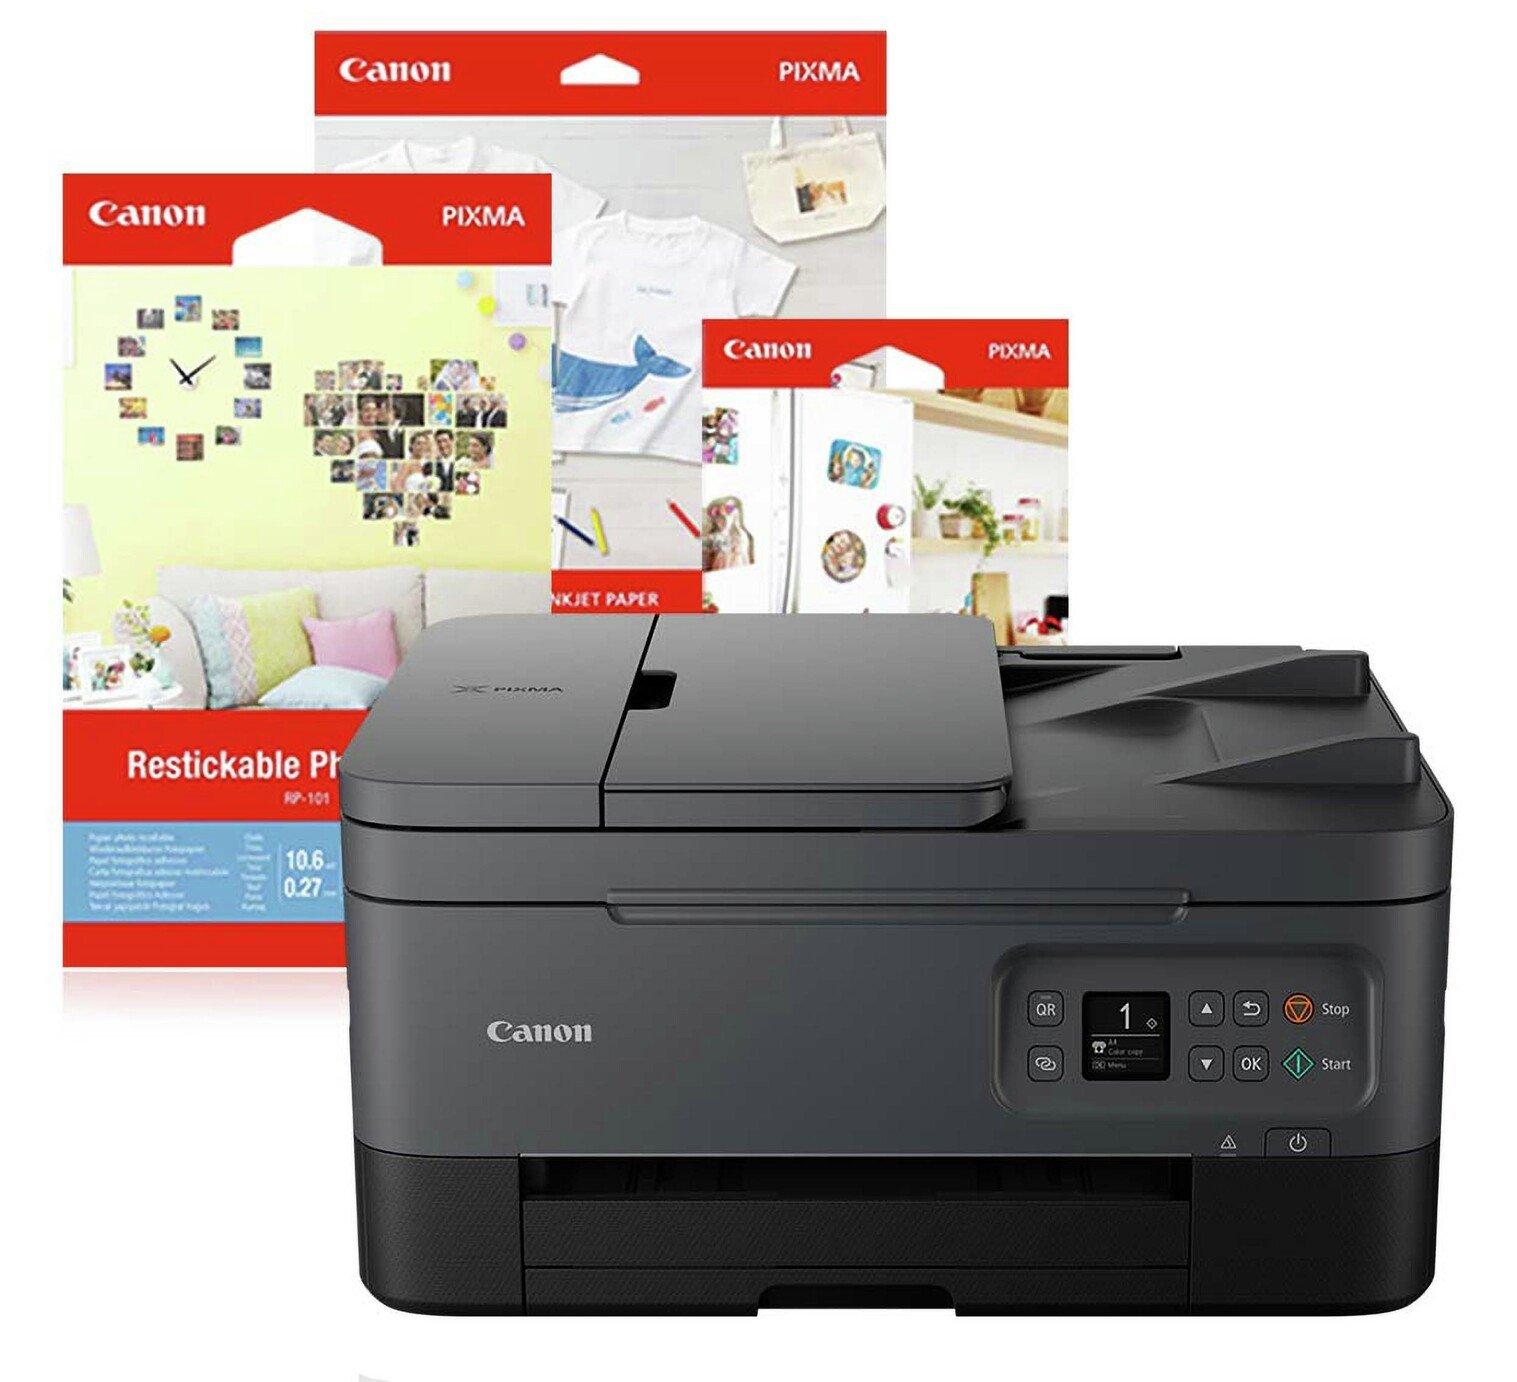 Canon PIXMA TS7450 Wireless Inkjet Printer Crafting Bundle